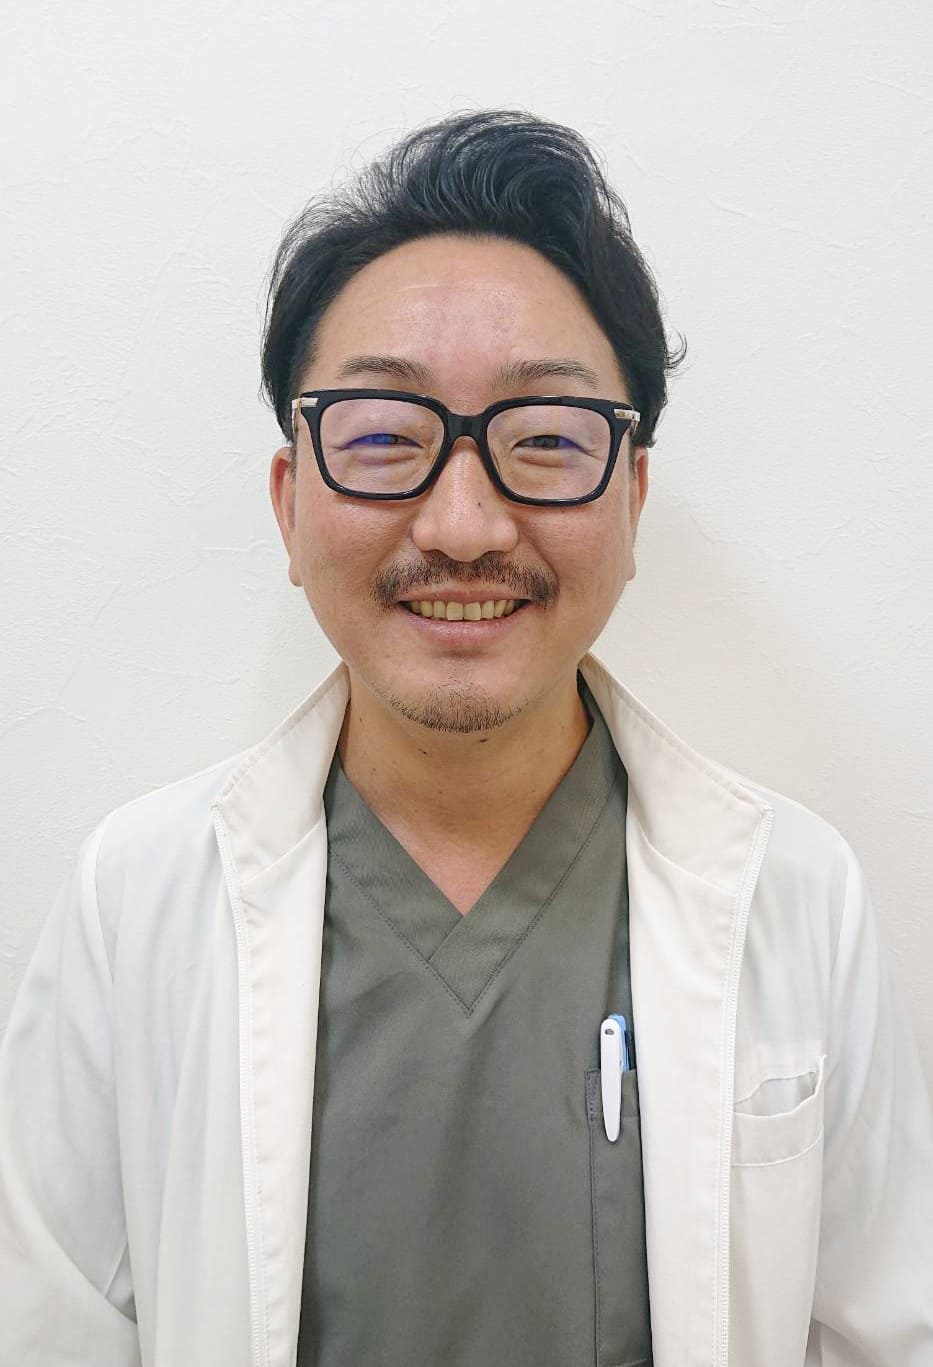 世田谷北沢 下北沢駅前歯科クリニック 村上浩史